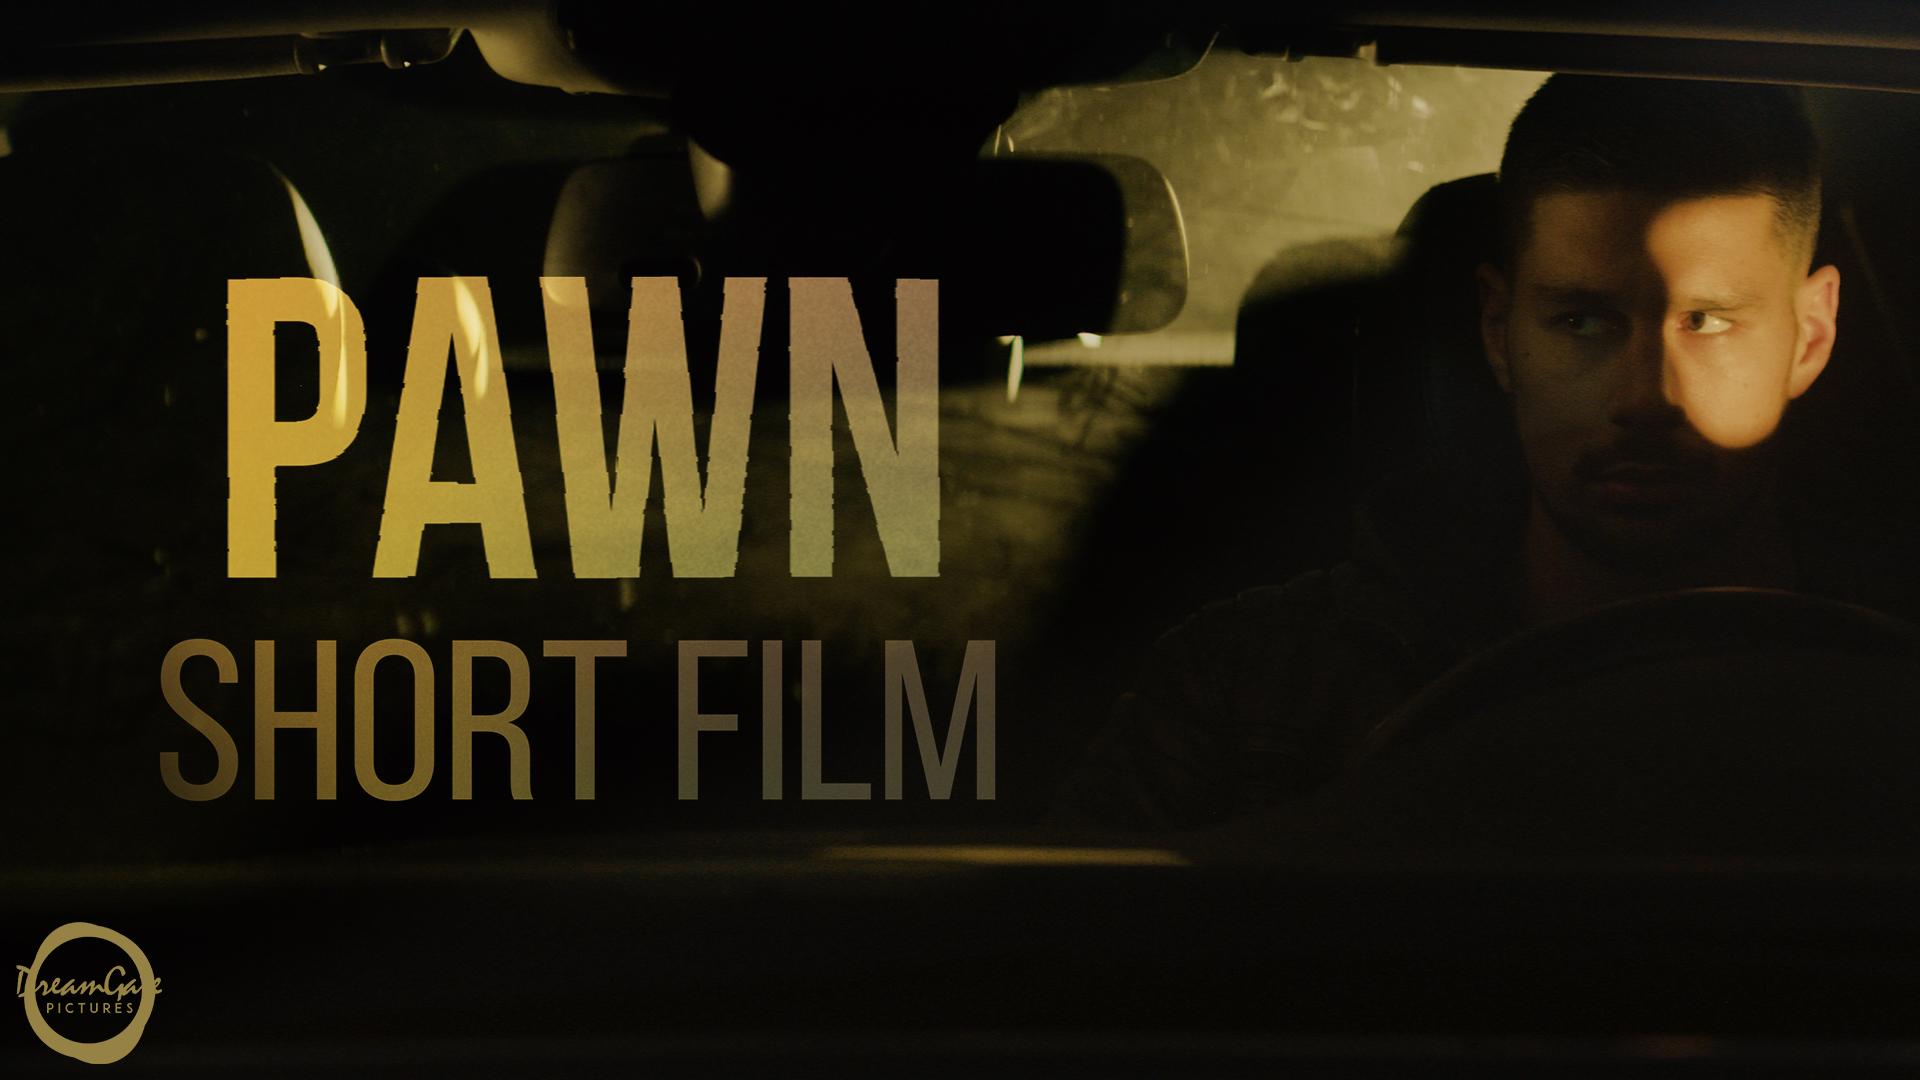 PAWN - Short Film Watermarked